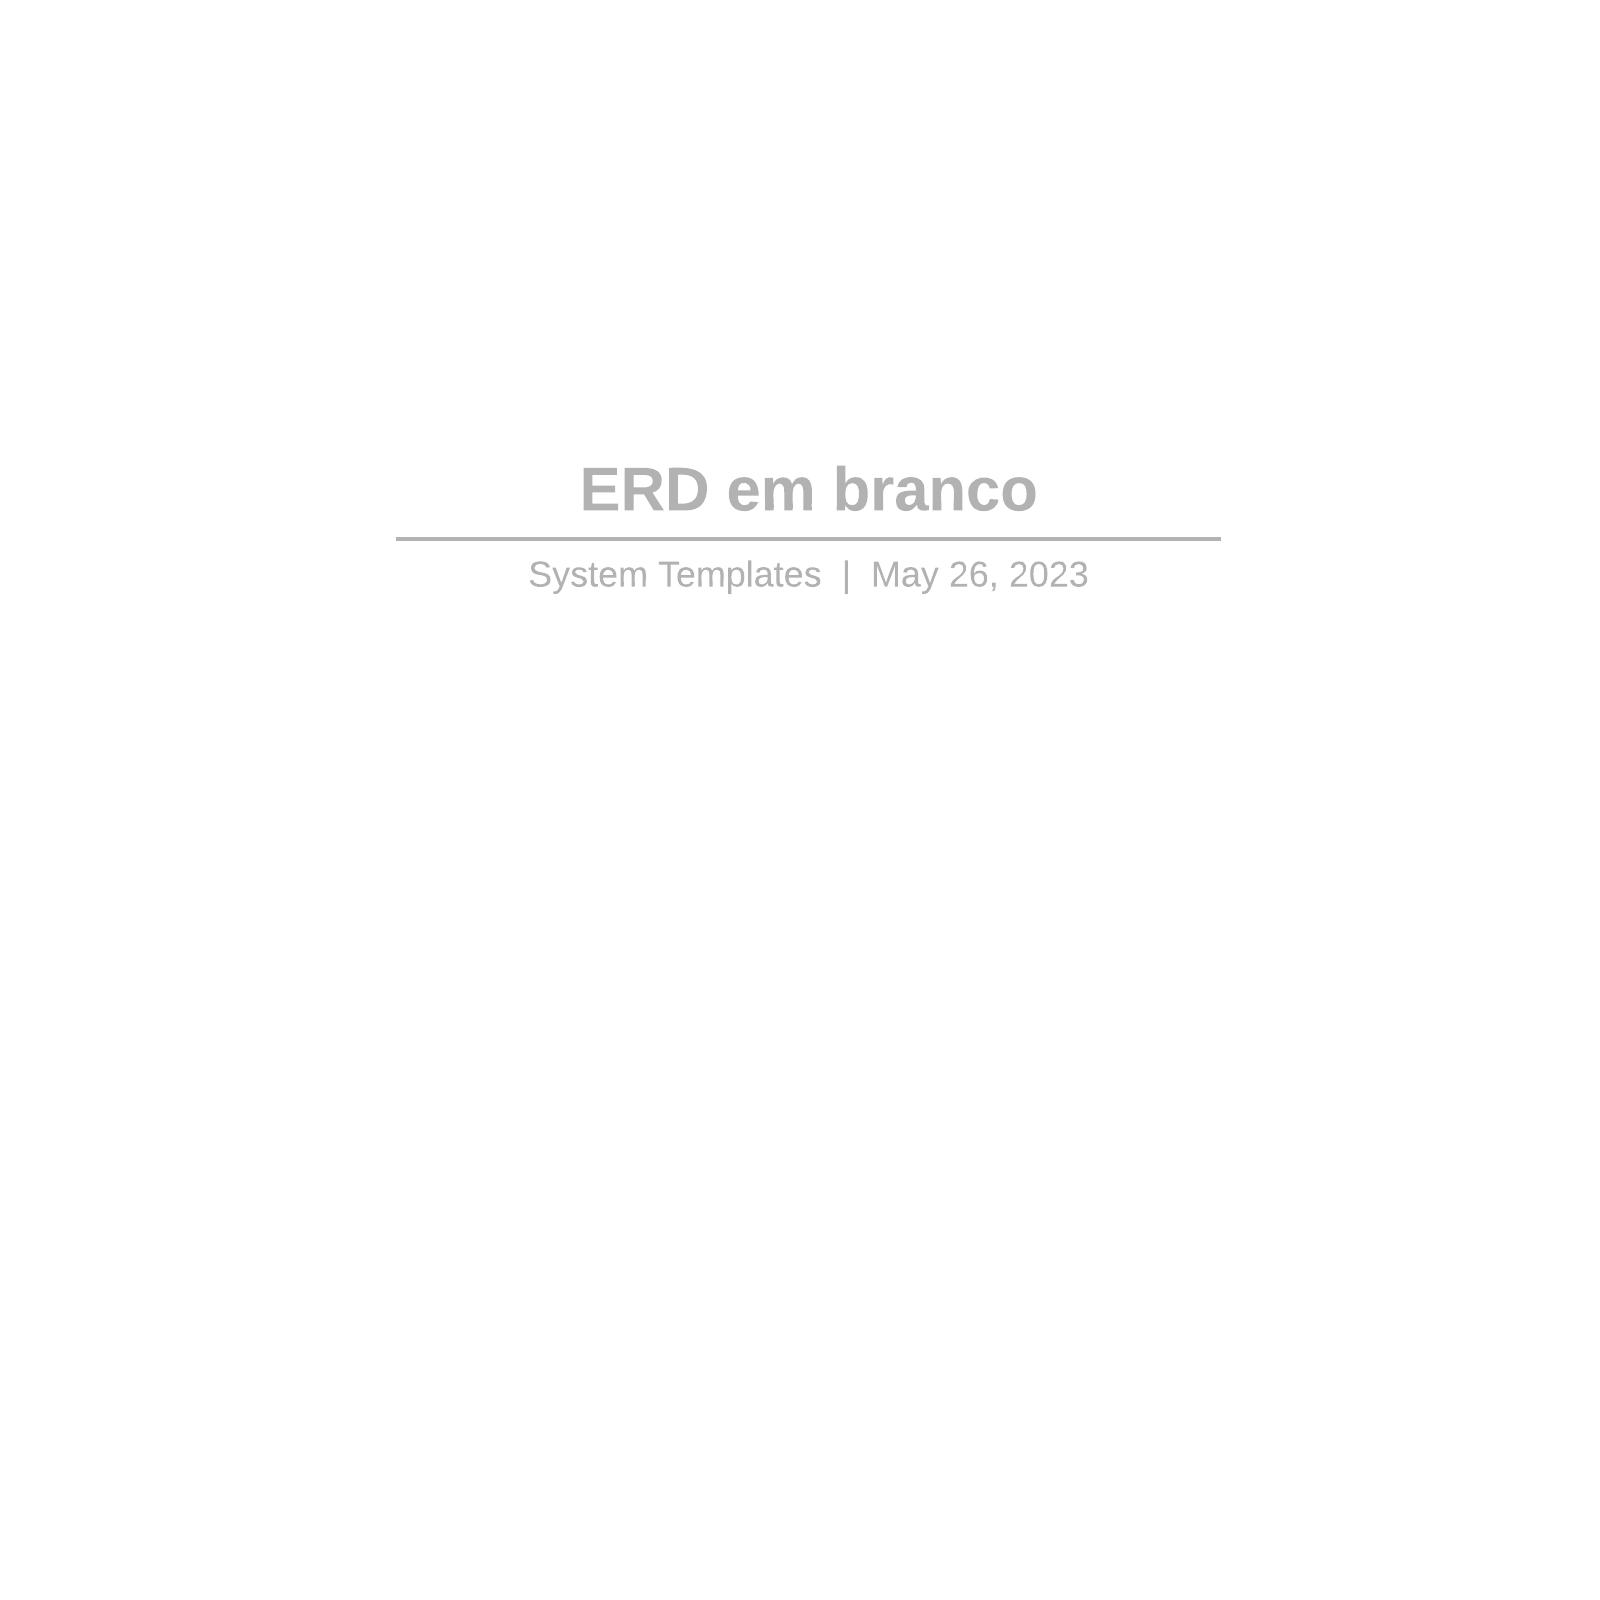 ERD em branco